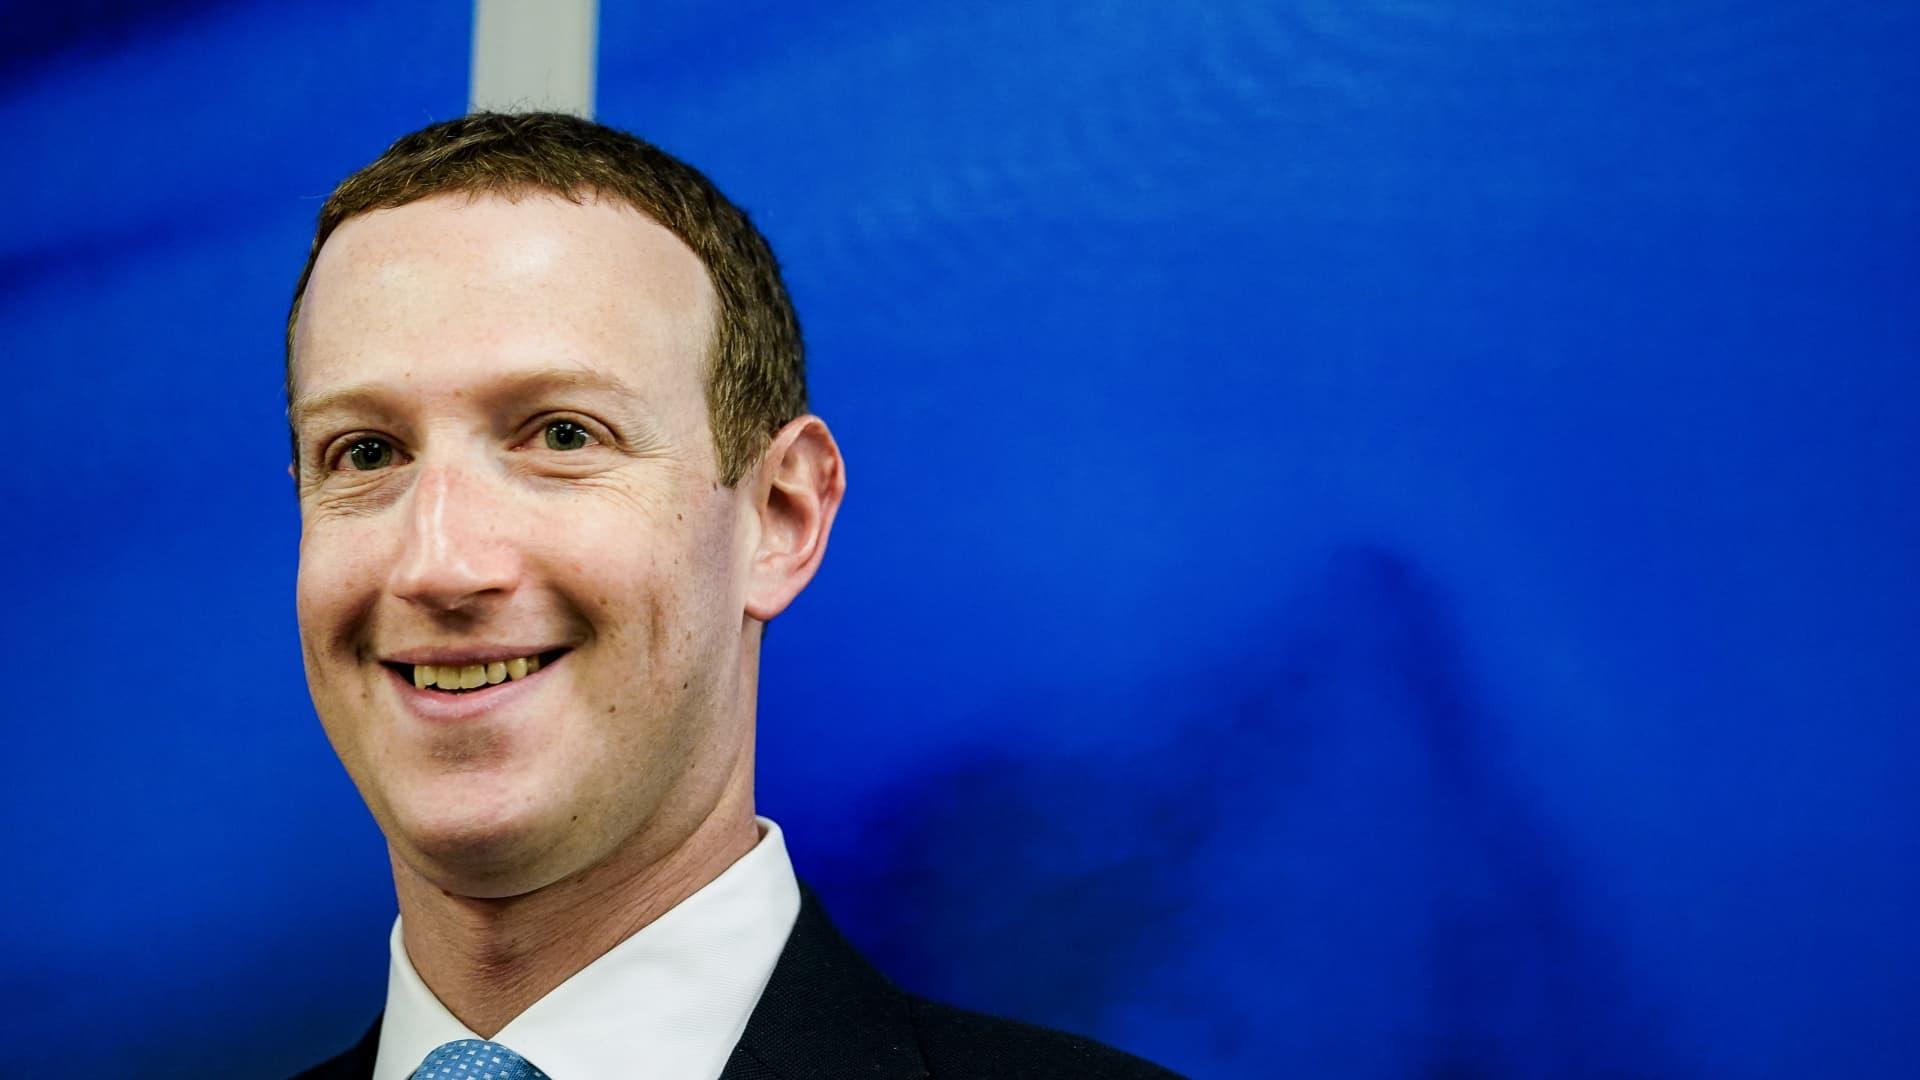 Facebook CEO Mark Zuckerberg in 2017.